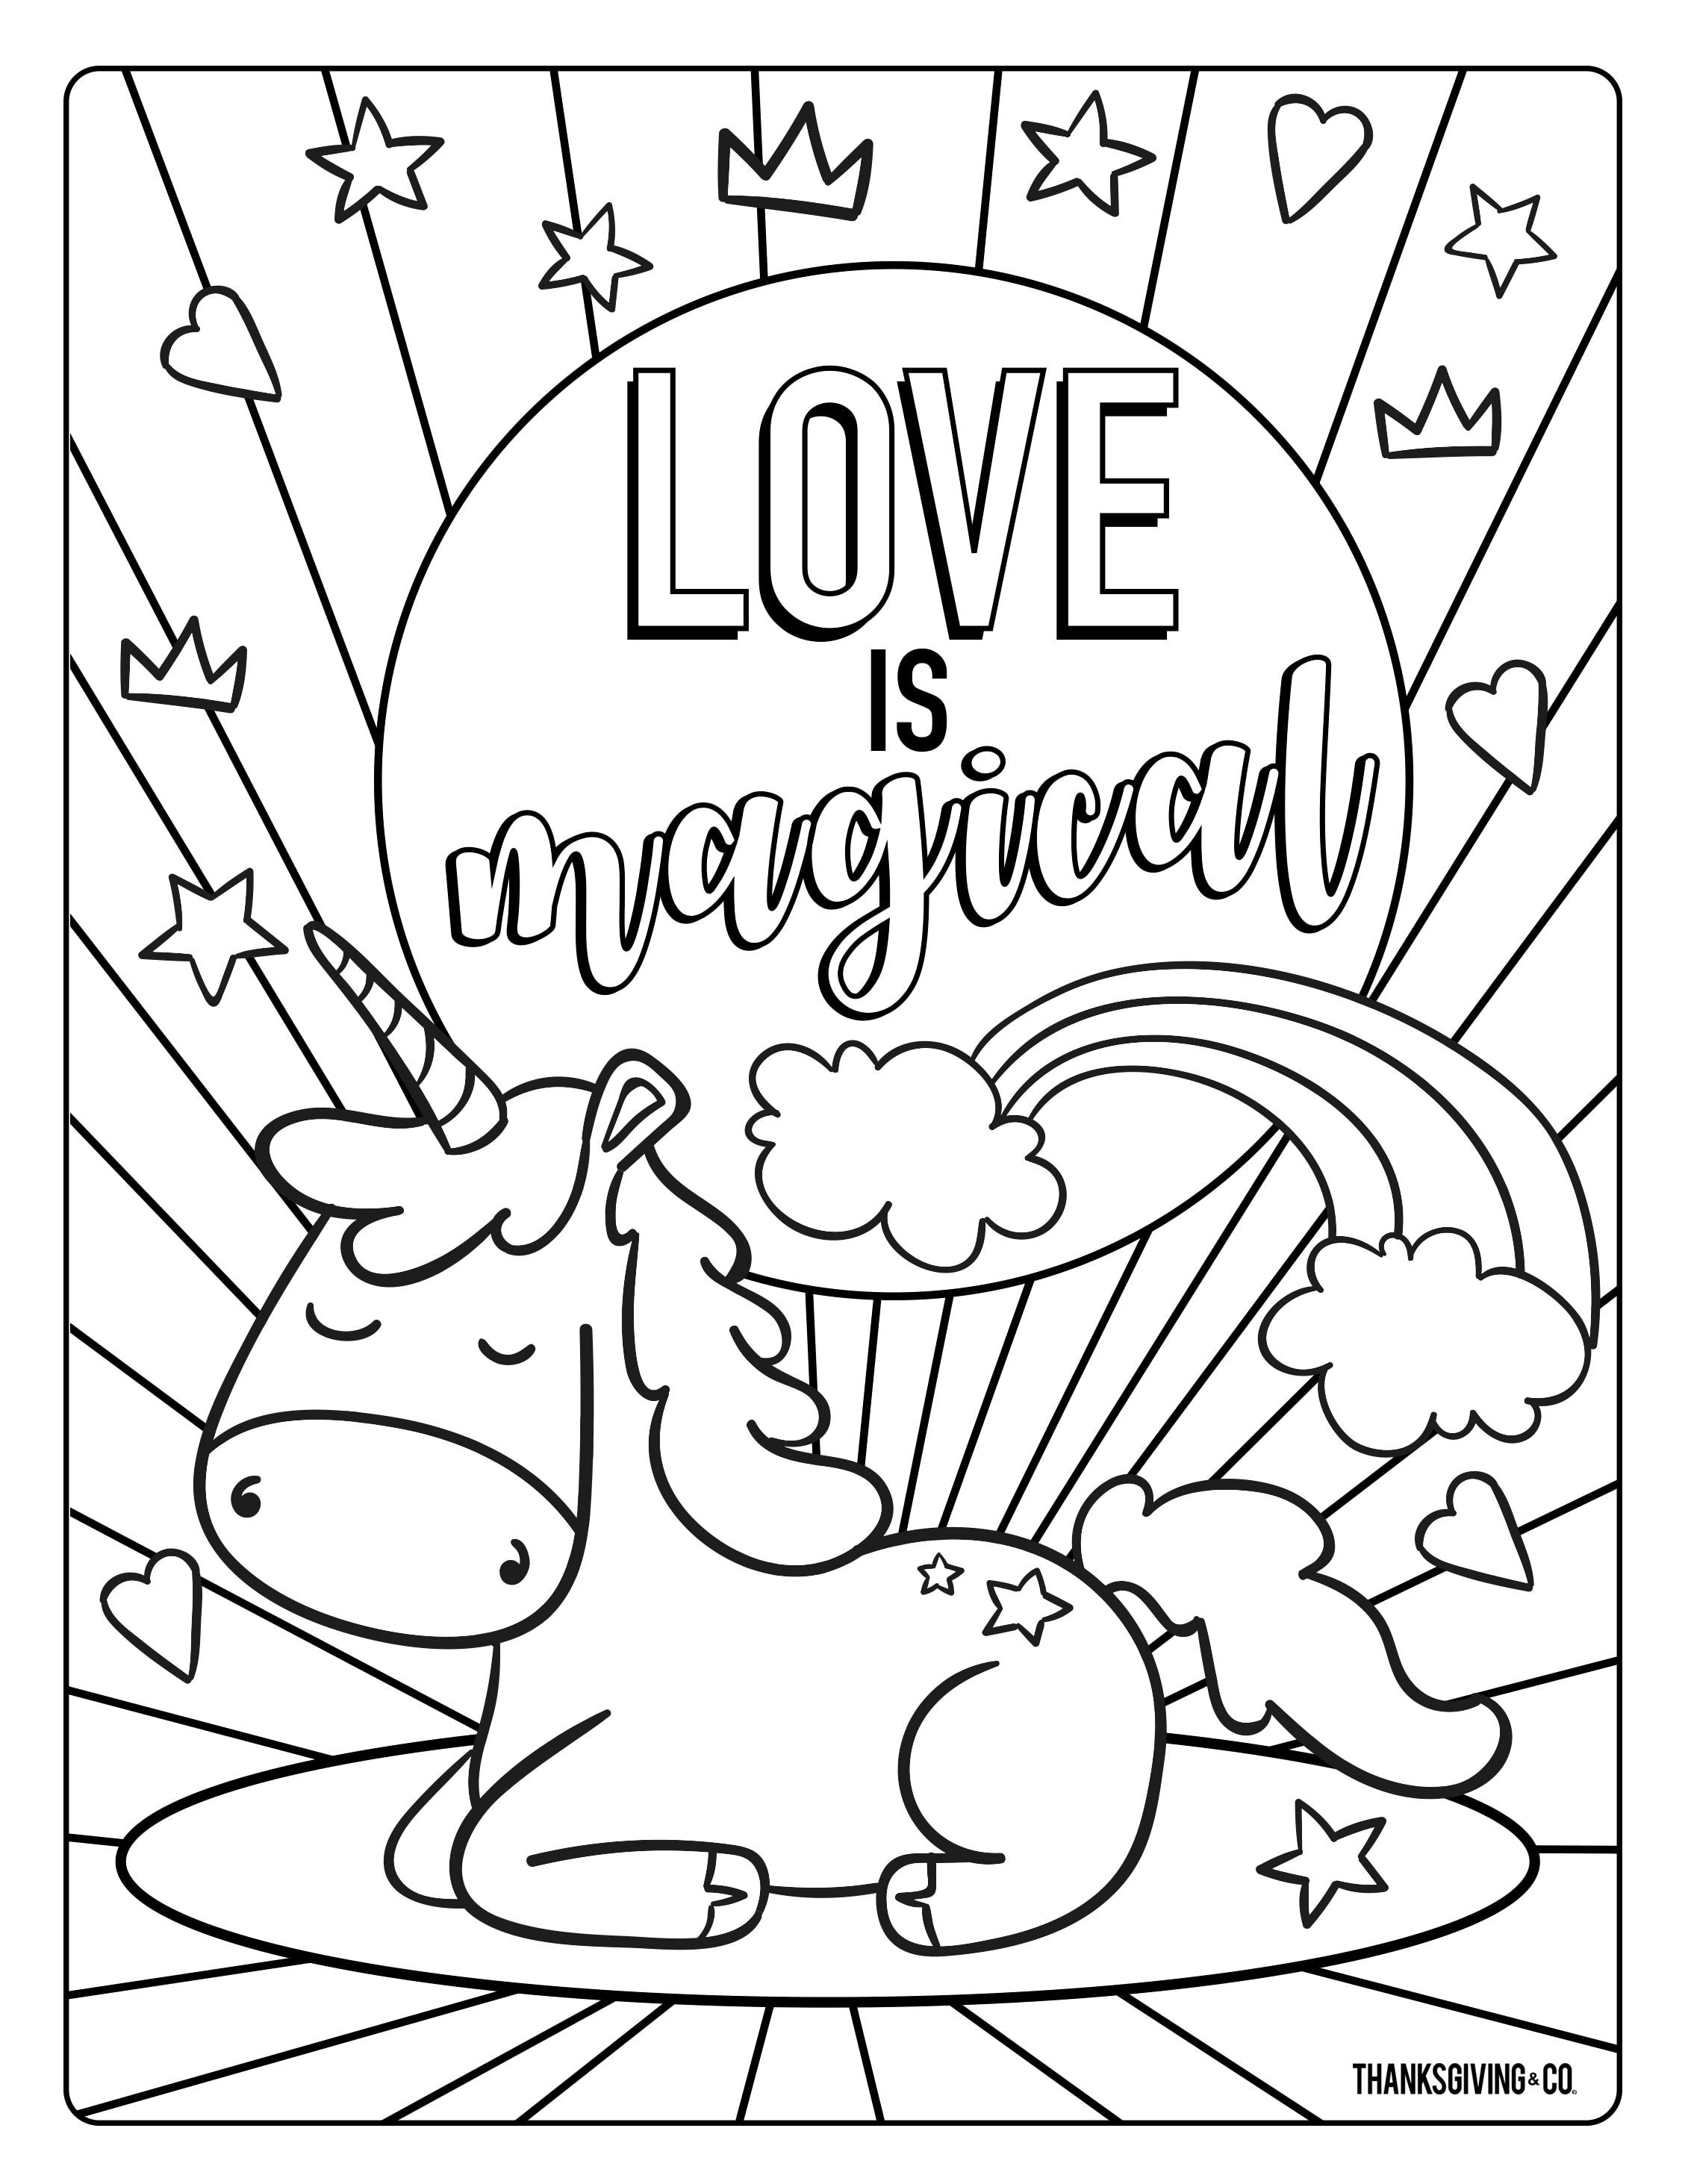 ValentineDay Coloring 1 RV